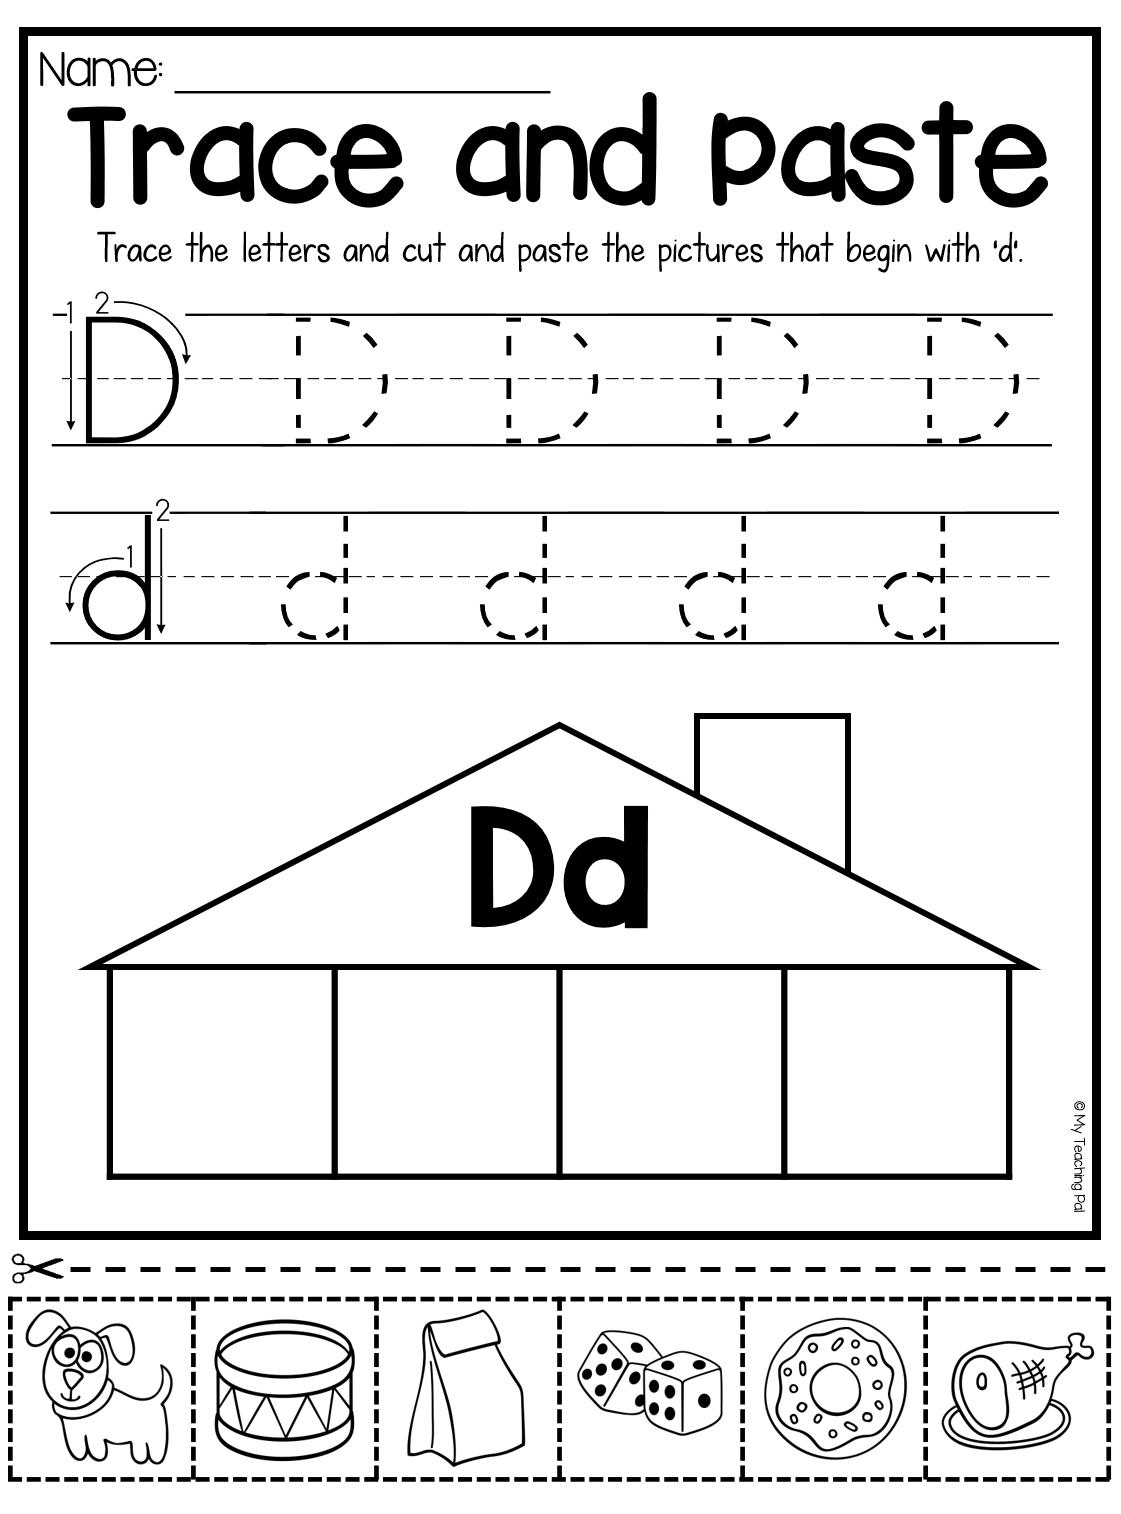 medium resolution of Beginning Sounds Worksheets - Trace and Paste   Letter d worksheet